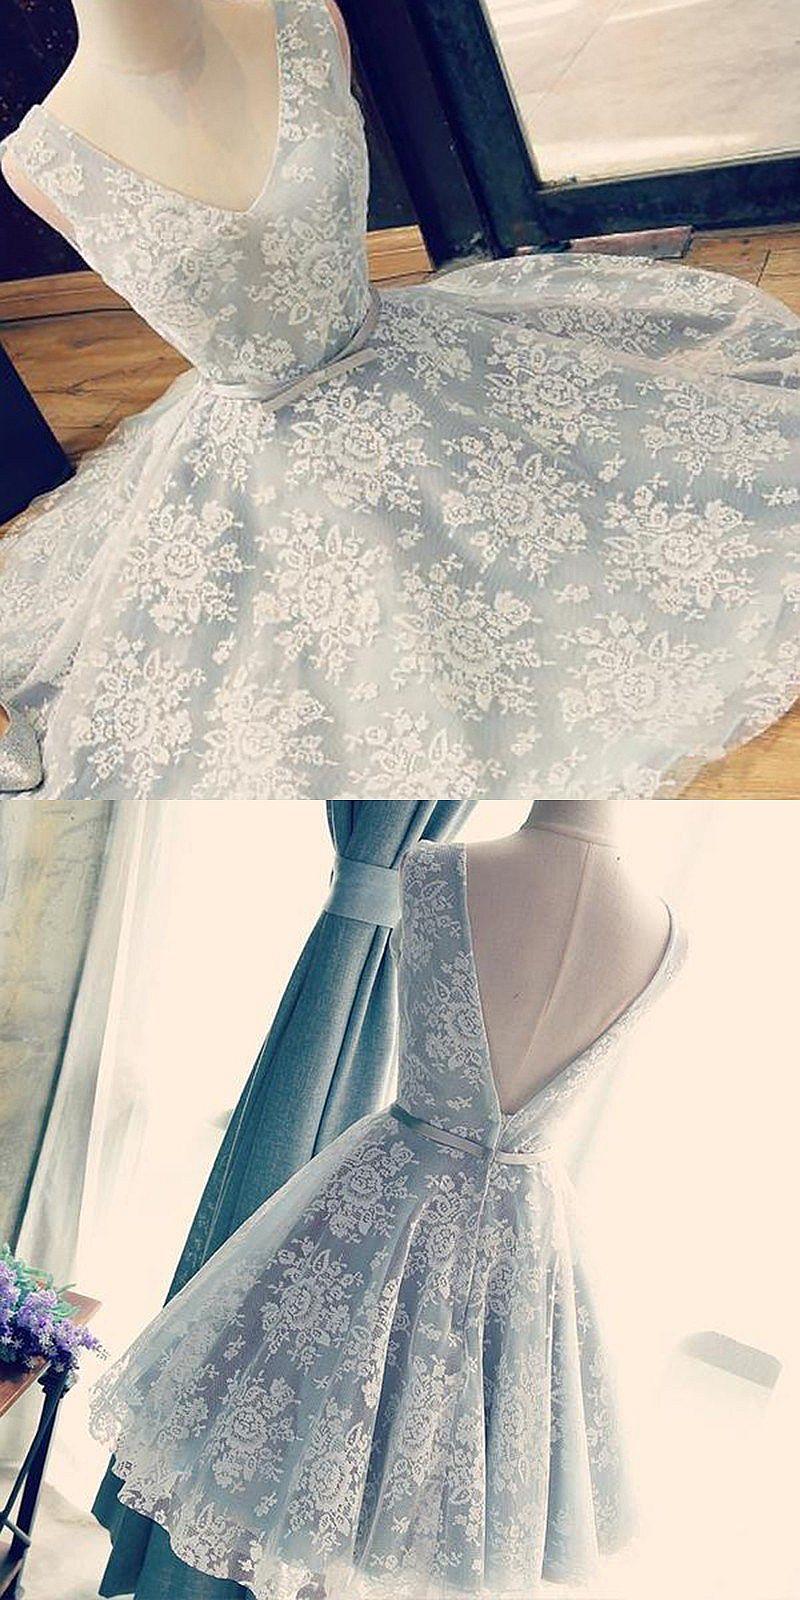 Aline vneck backless short light grey homecoming dress with sash